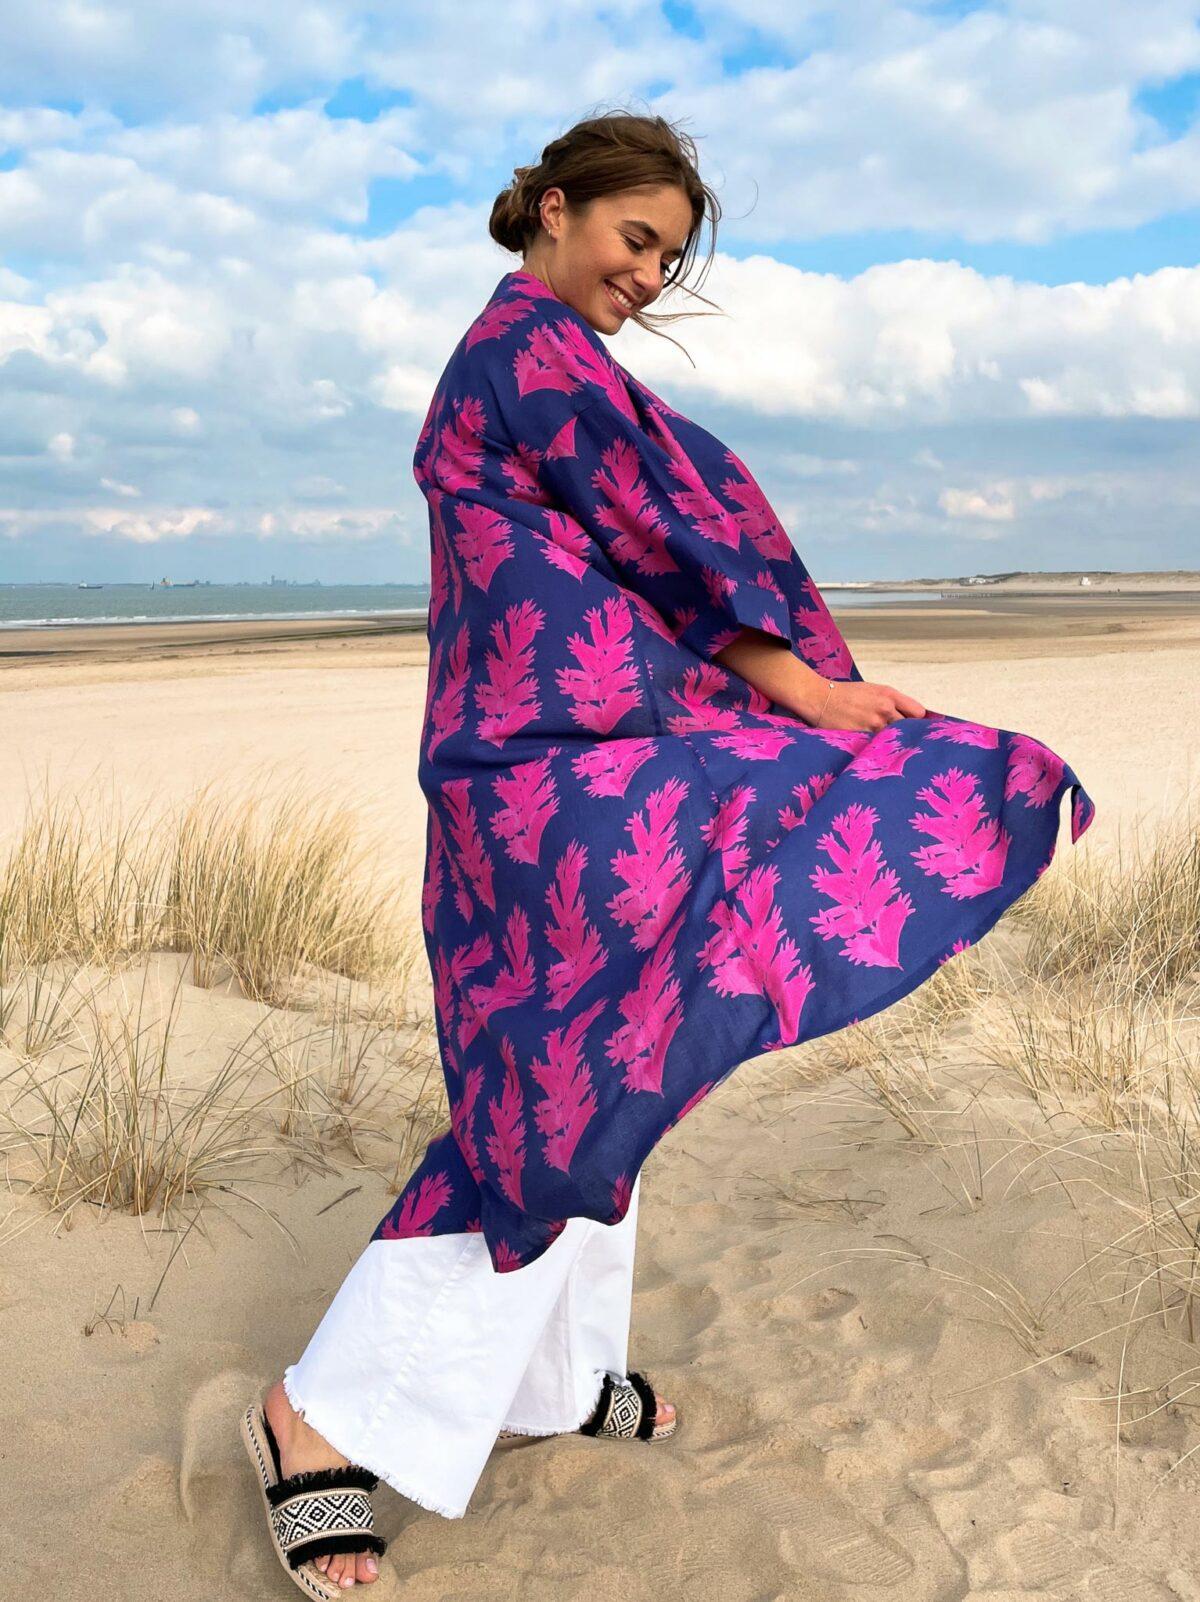 woman on the beach wearing a blue and fuchsia kimono